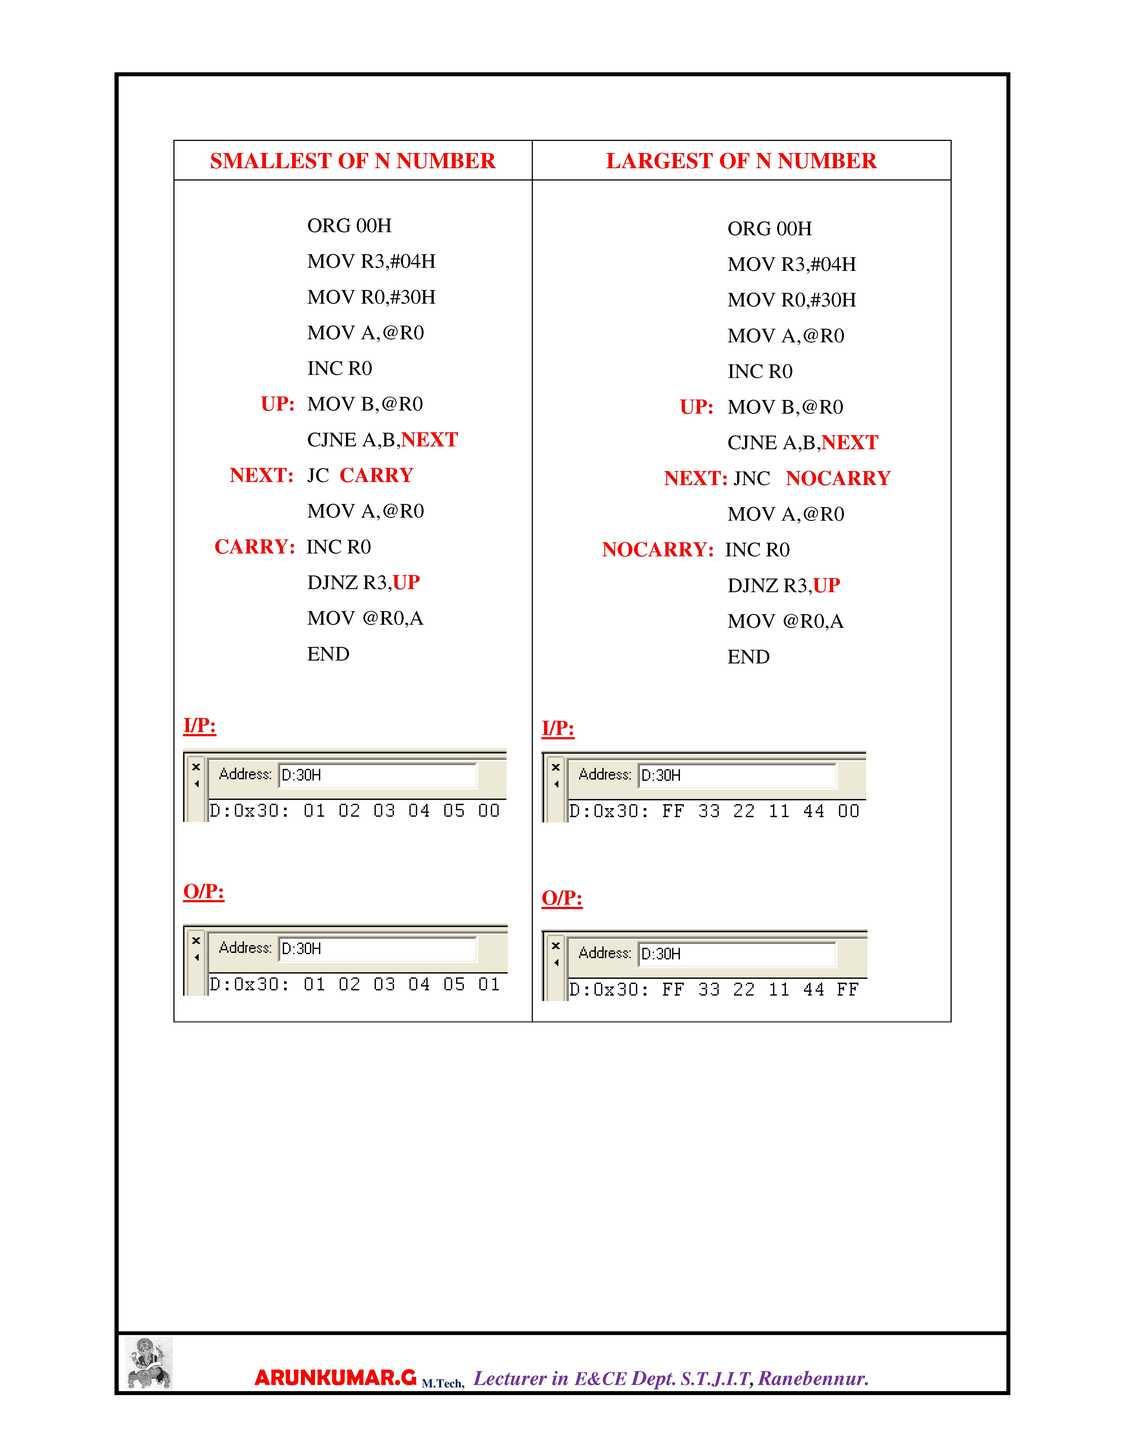 vtu microcontroller lab manual 2018 2019 eduvark rh eduvark com microcontroller 8051 lab manual vtu microcontroller lab manual with flowchart vtu